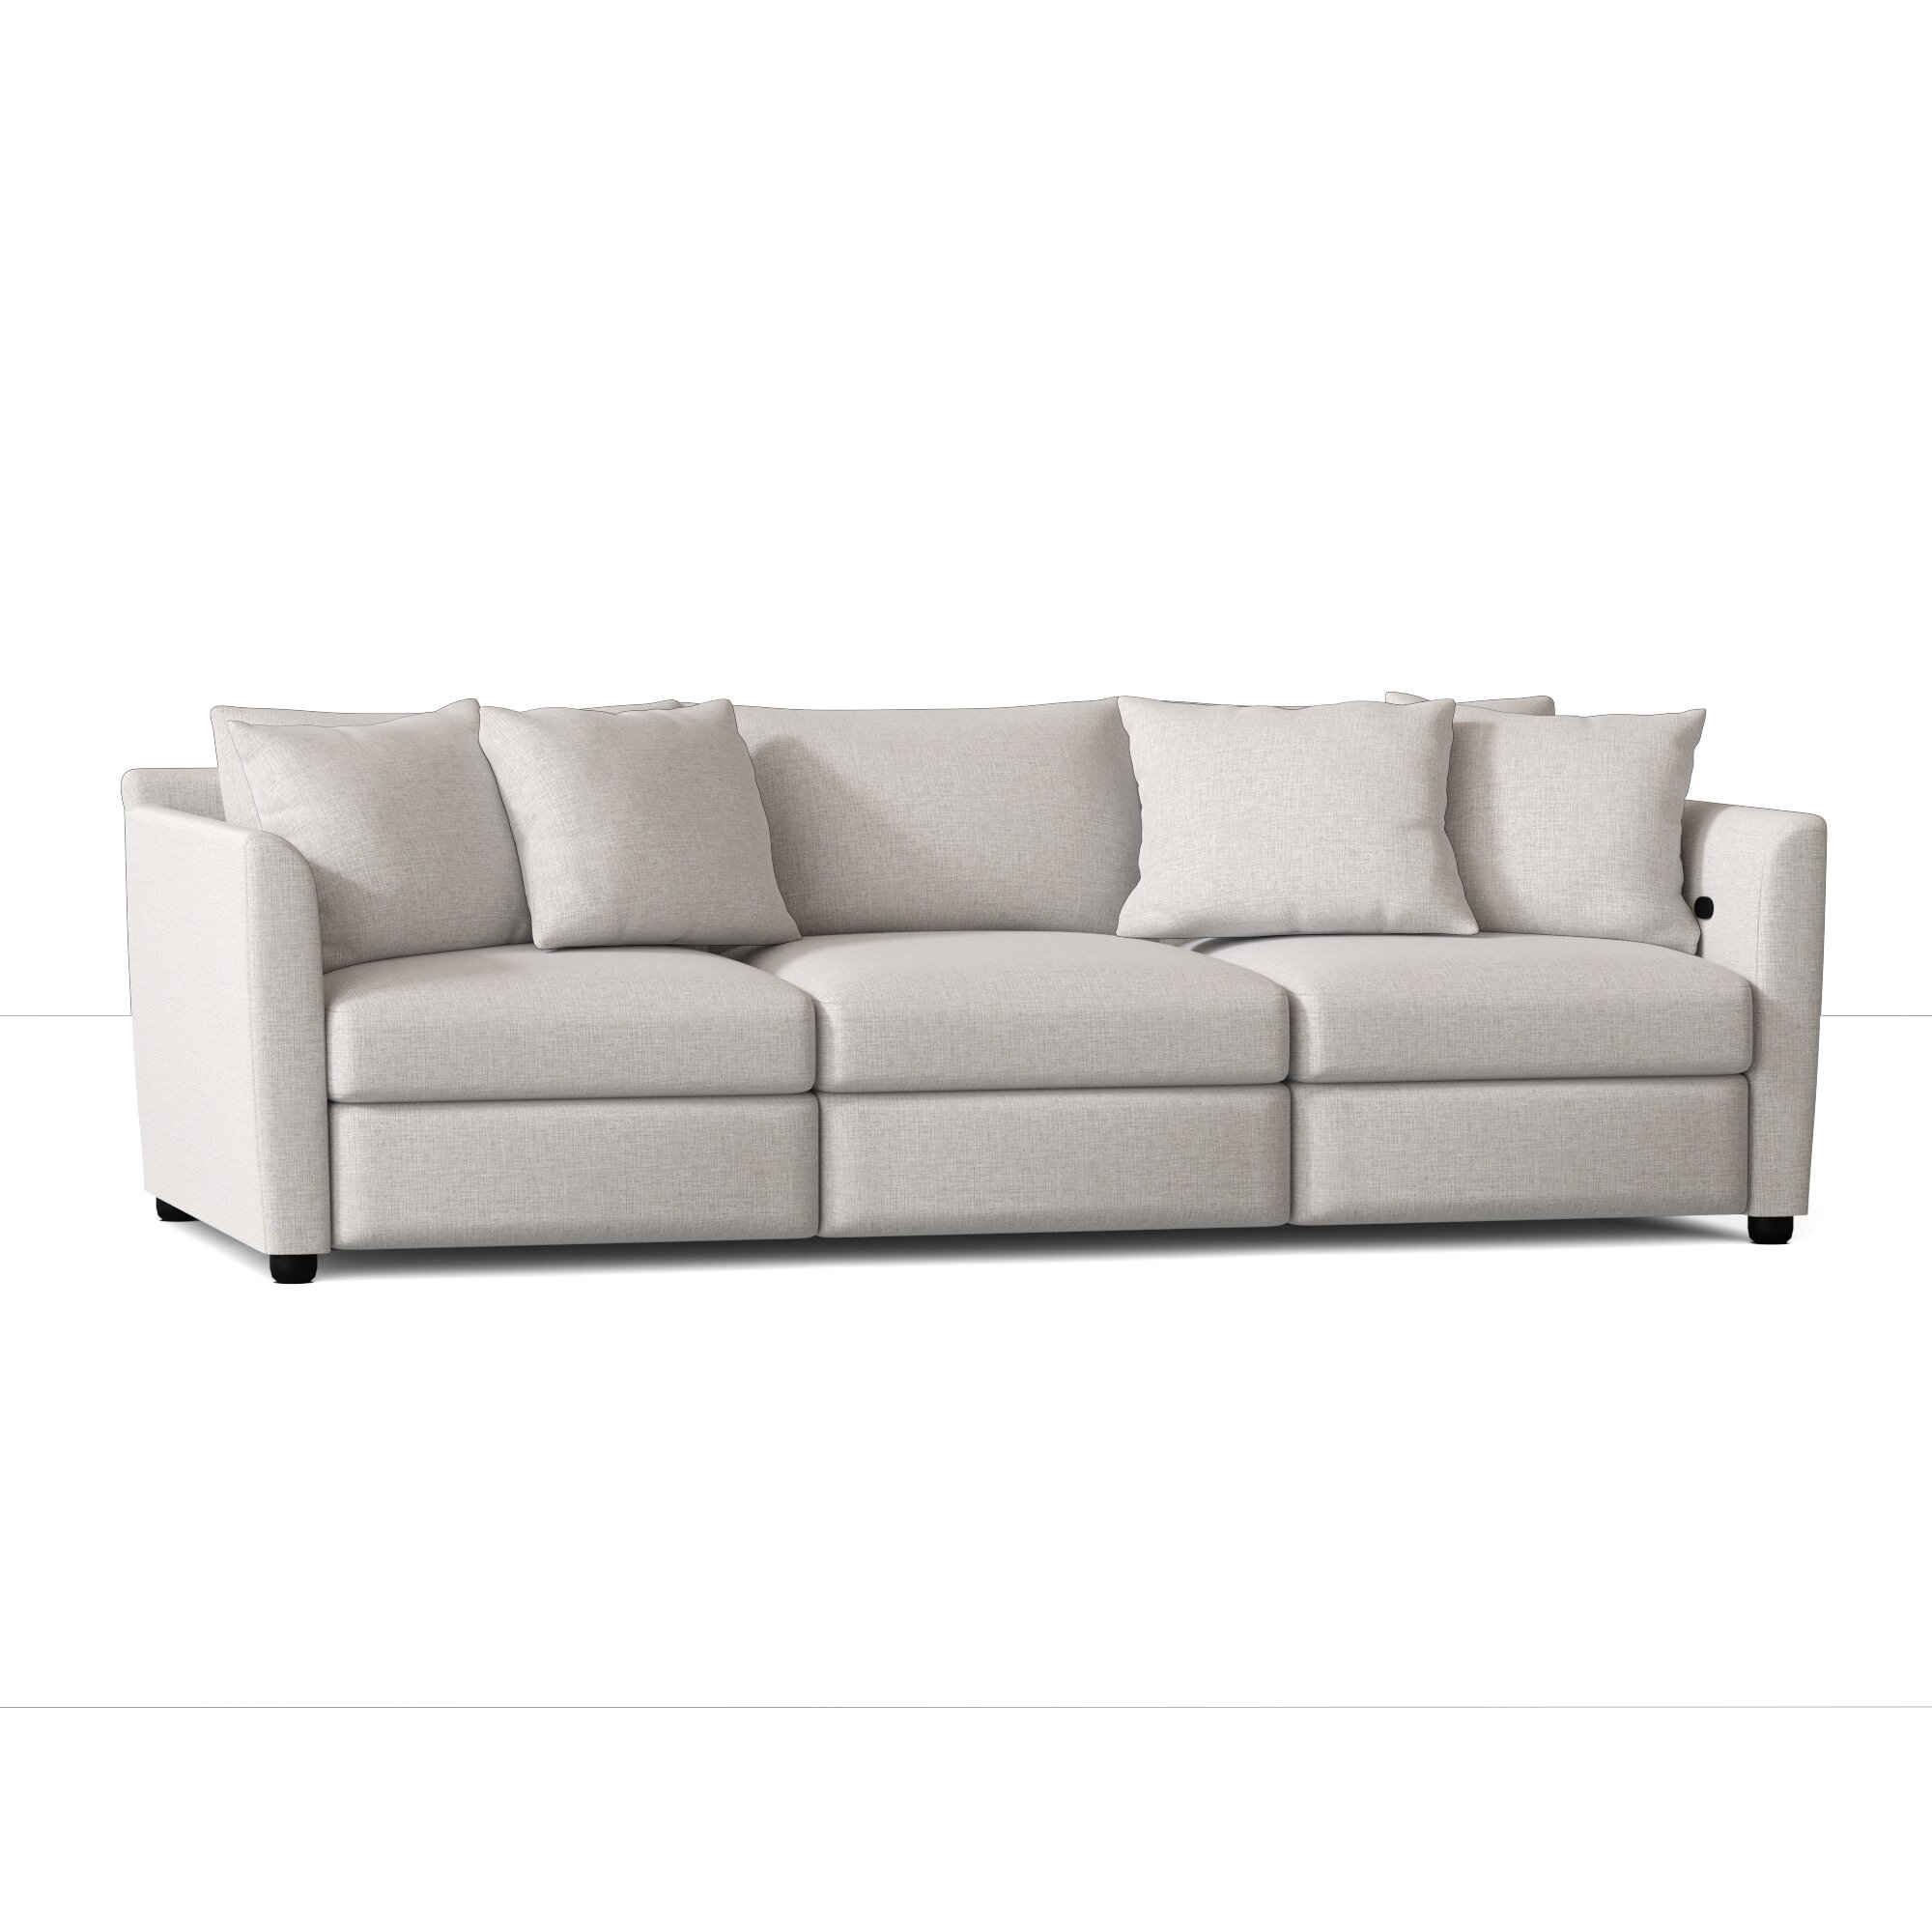 Cyrus Reclining Sofa Reviews Allmodern